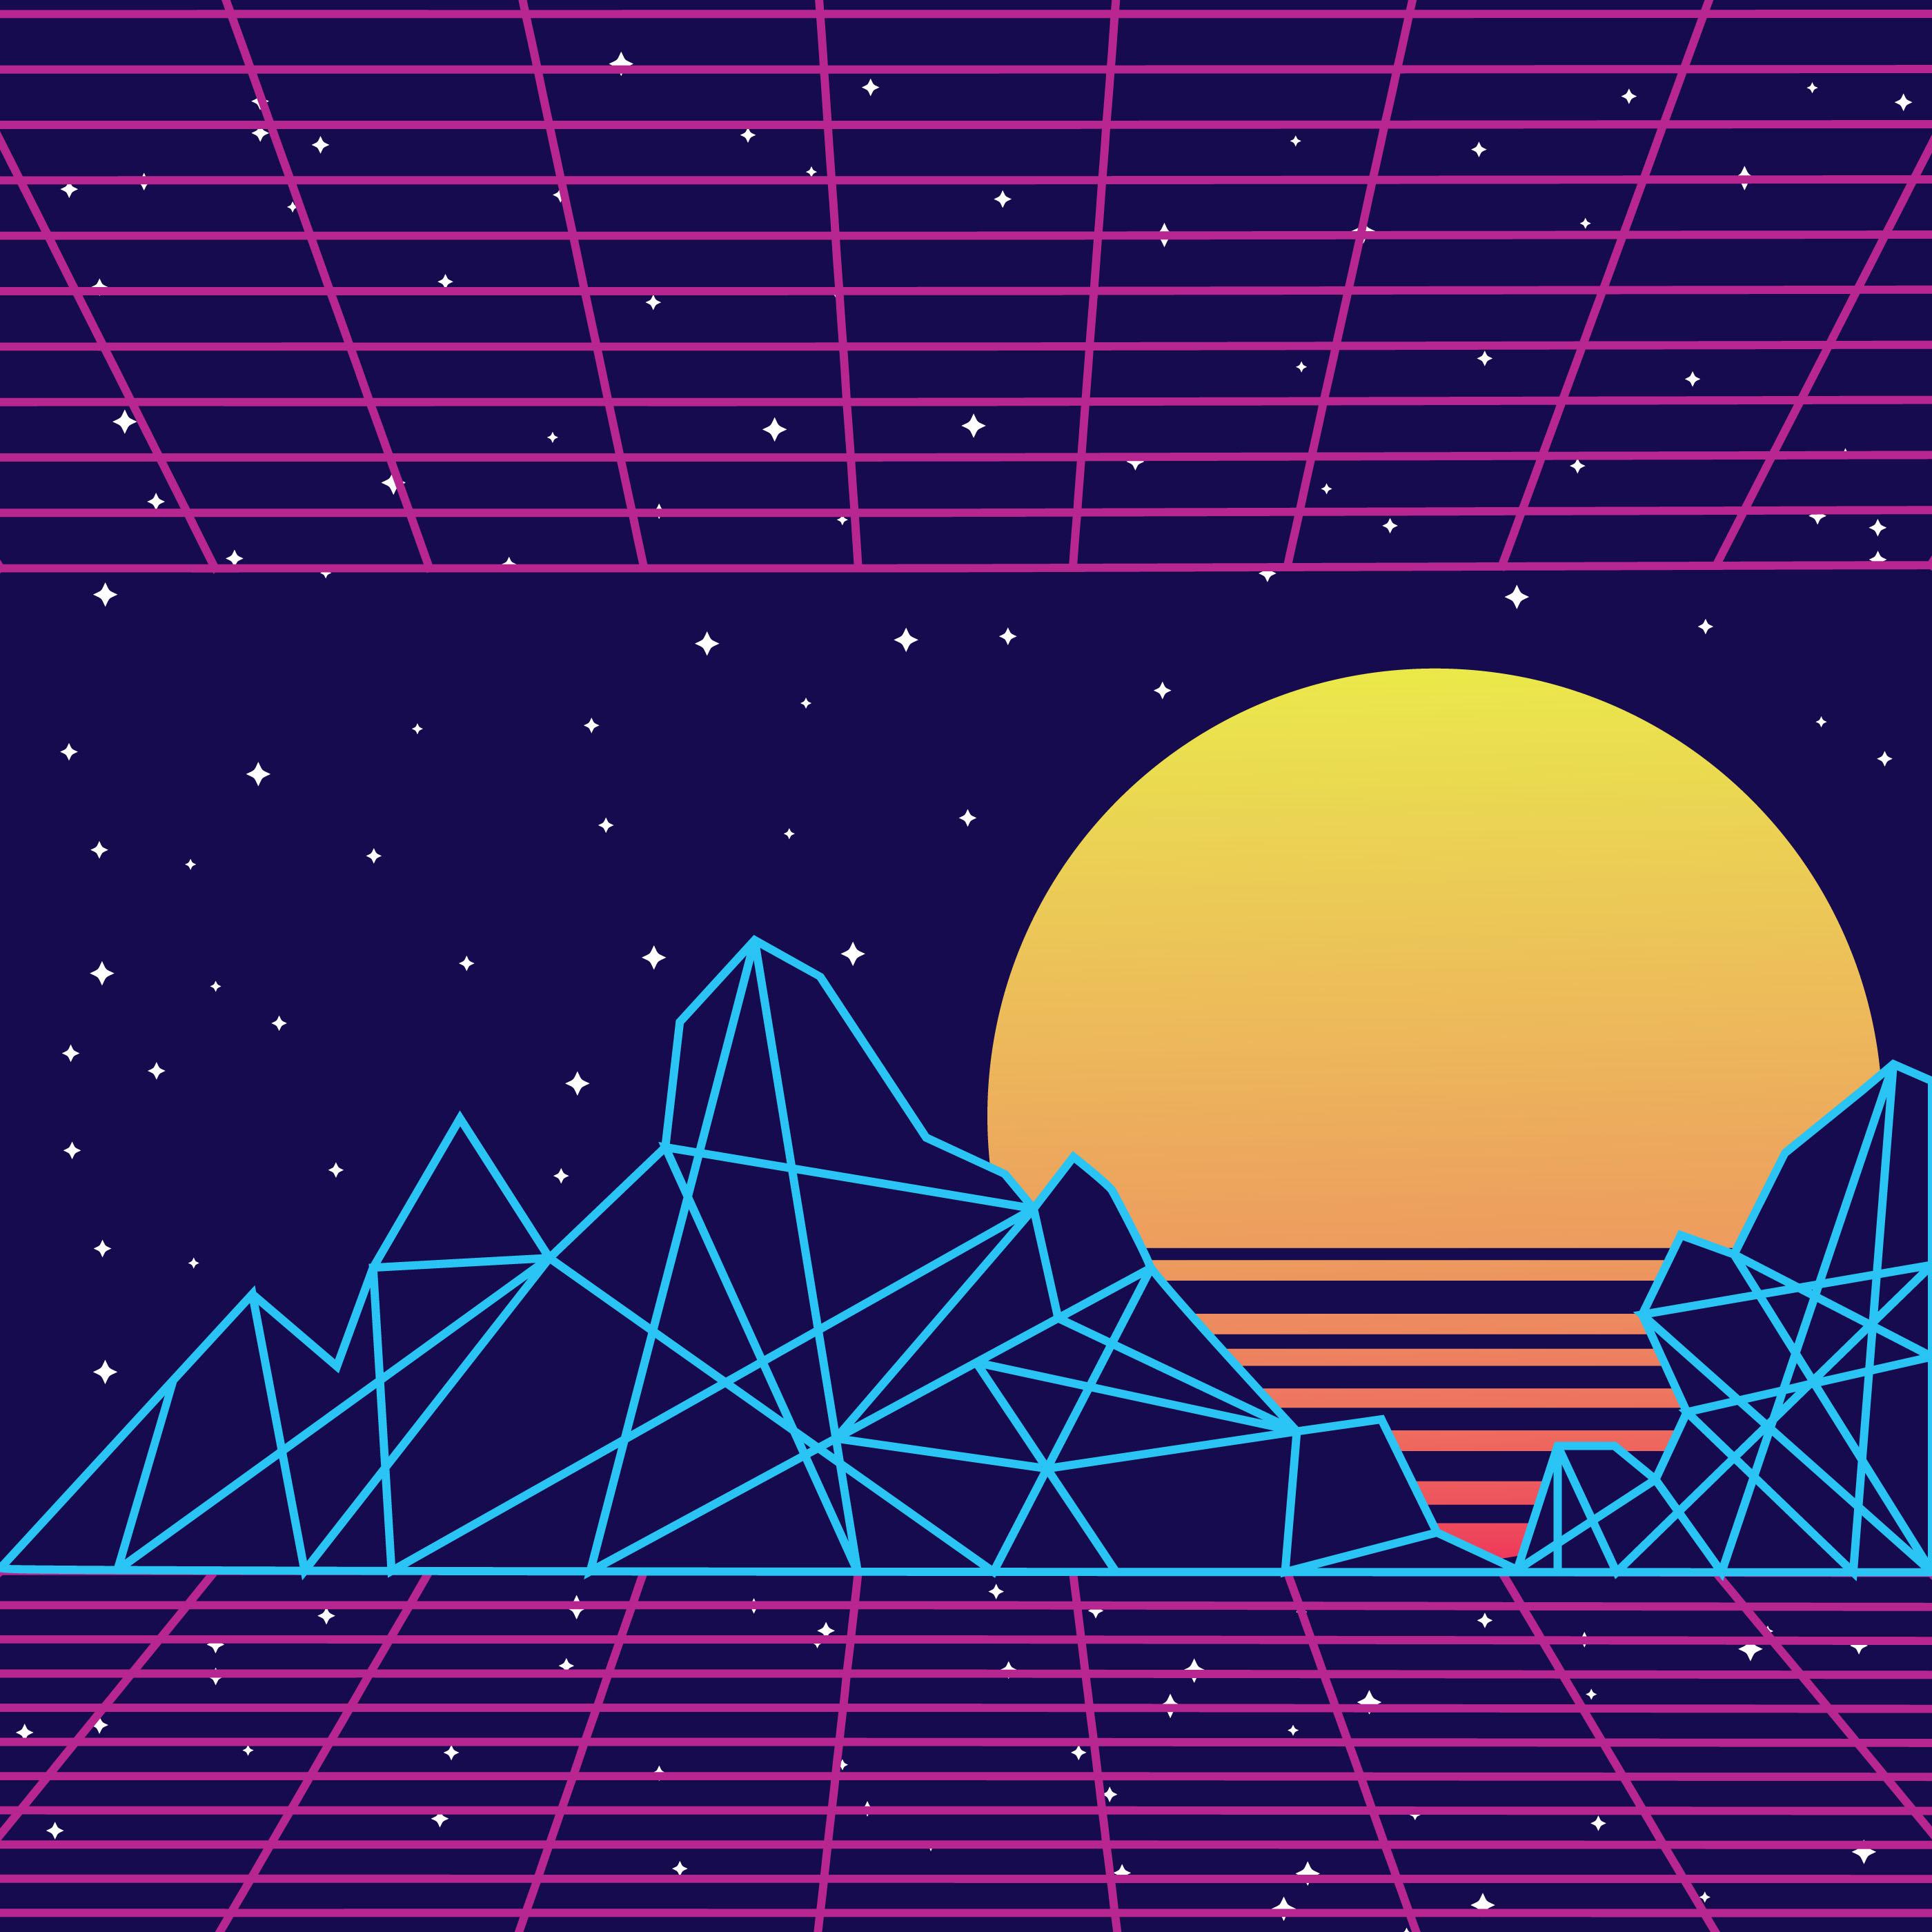 Vaporwave Free Vector Art - (58 Free Downloads)